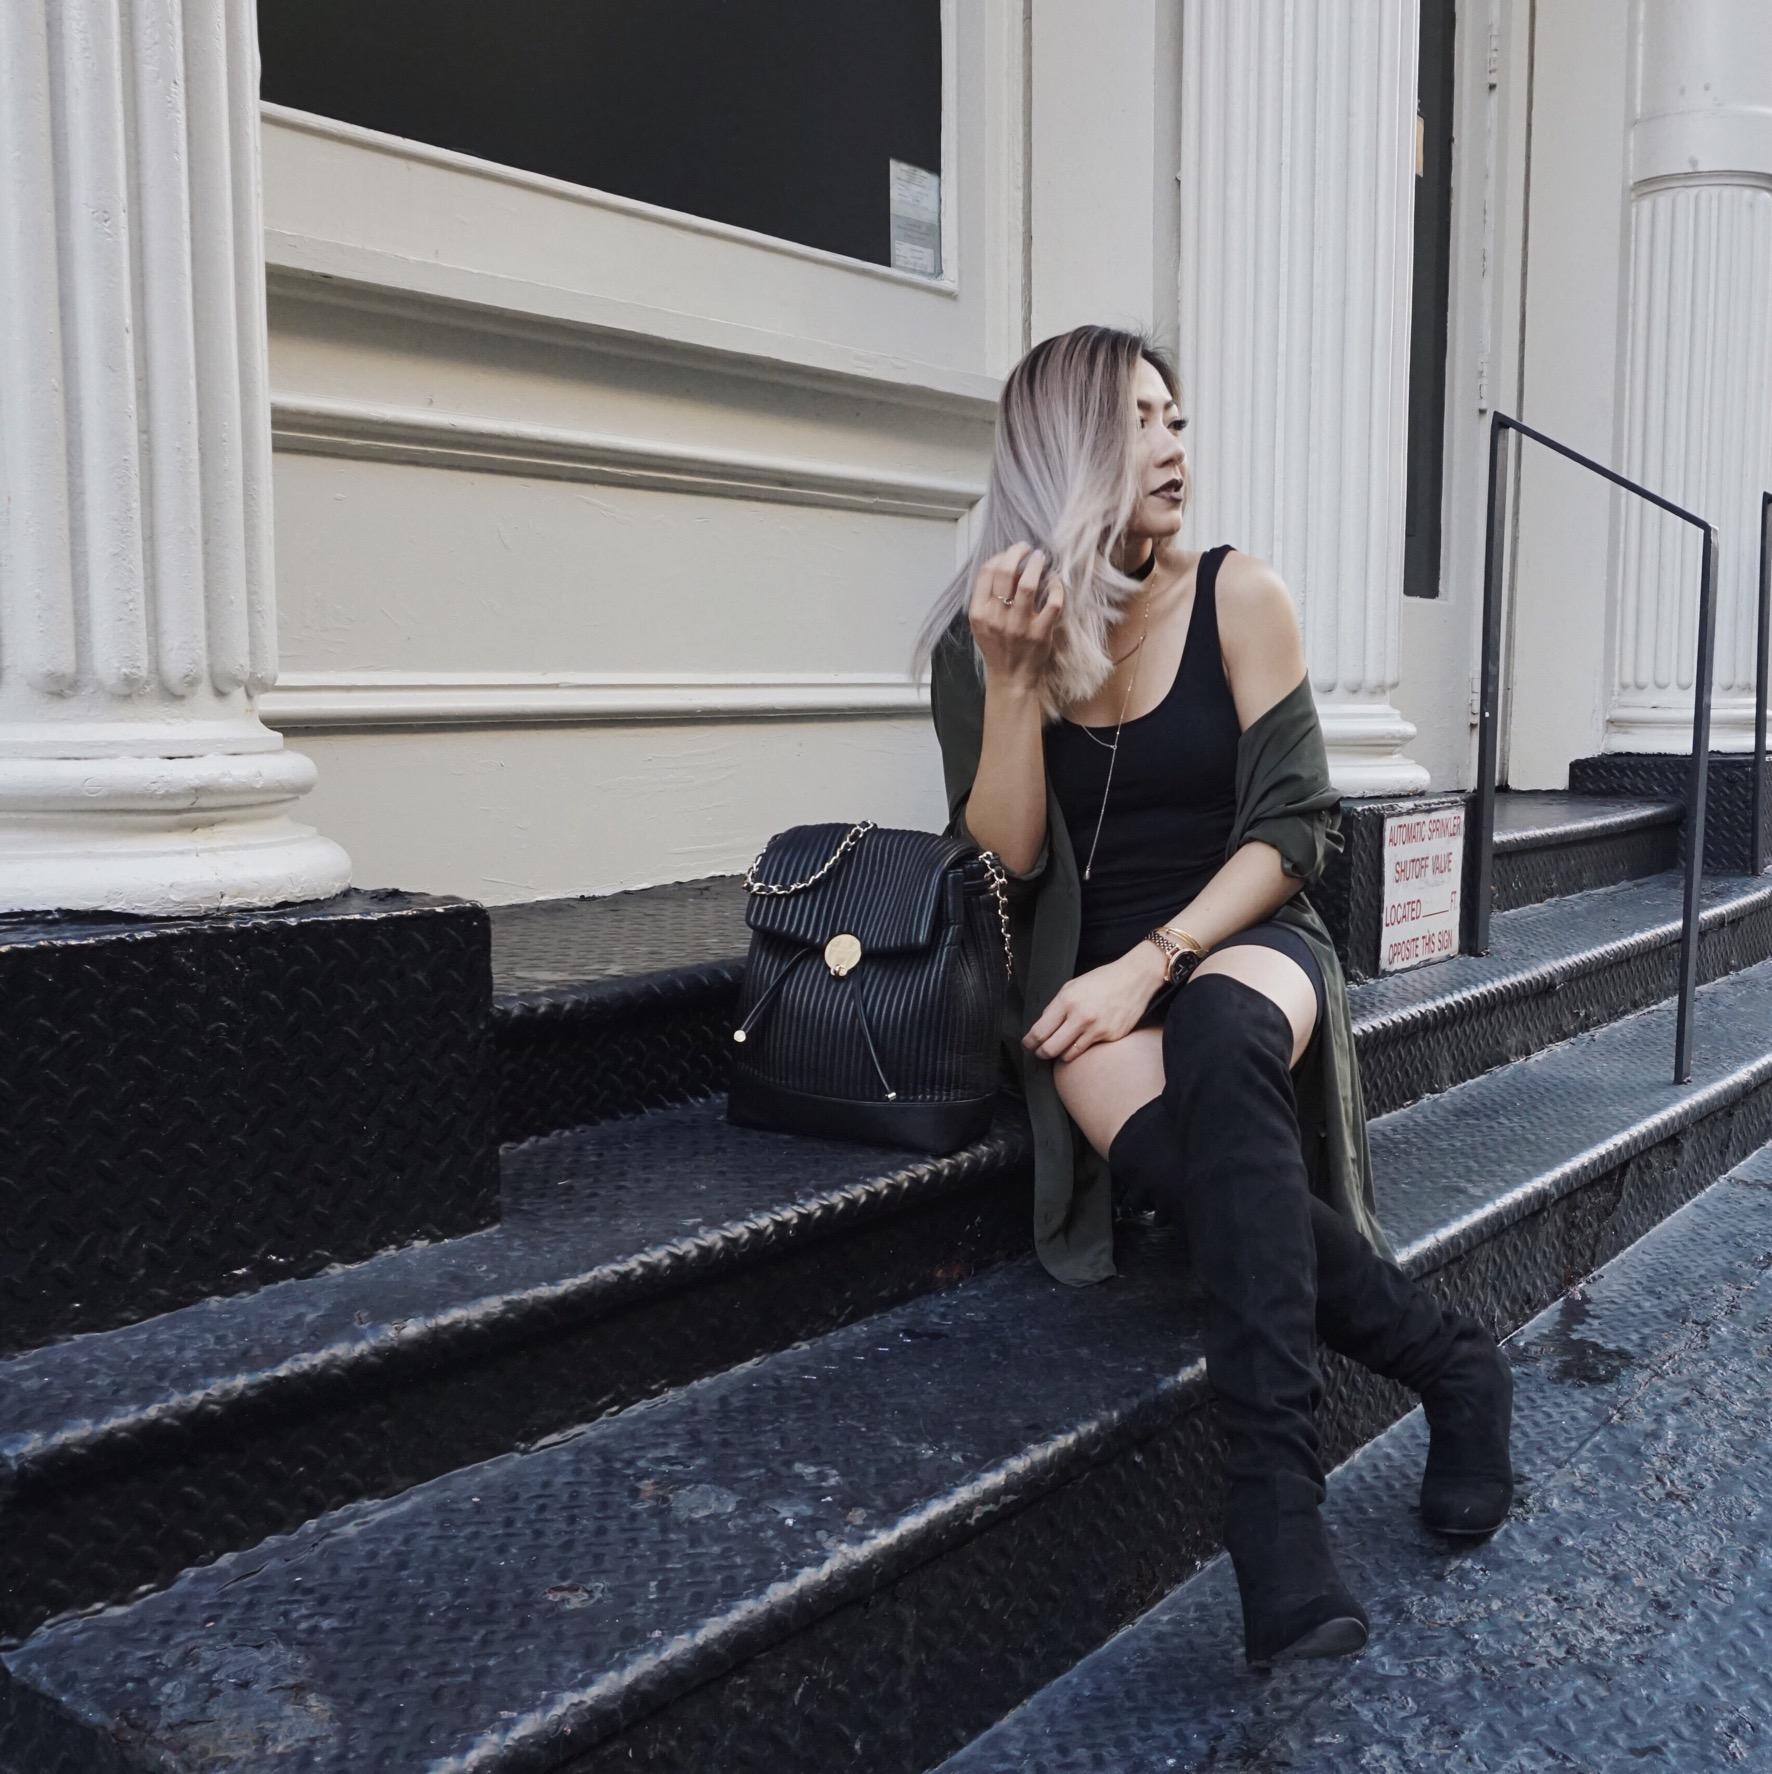 Henri bendel No. 7 Convertible Backpack - Black, steve madden gorgeous boots